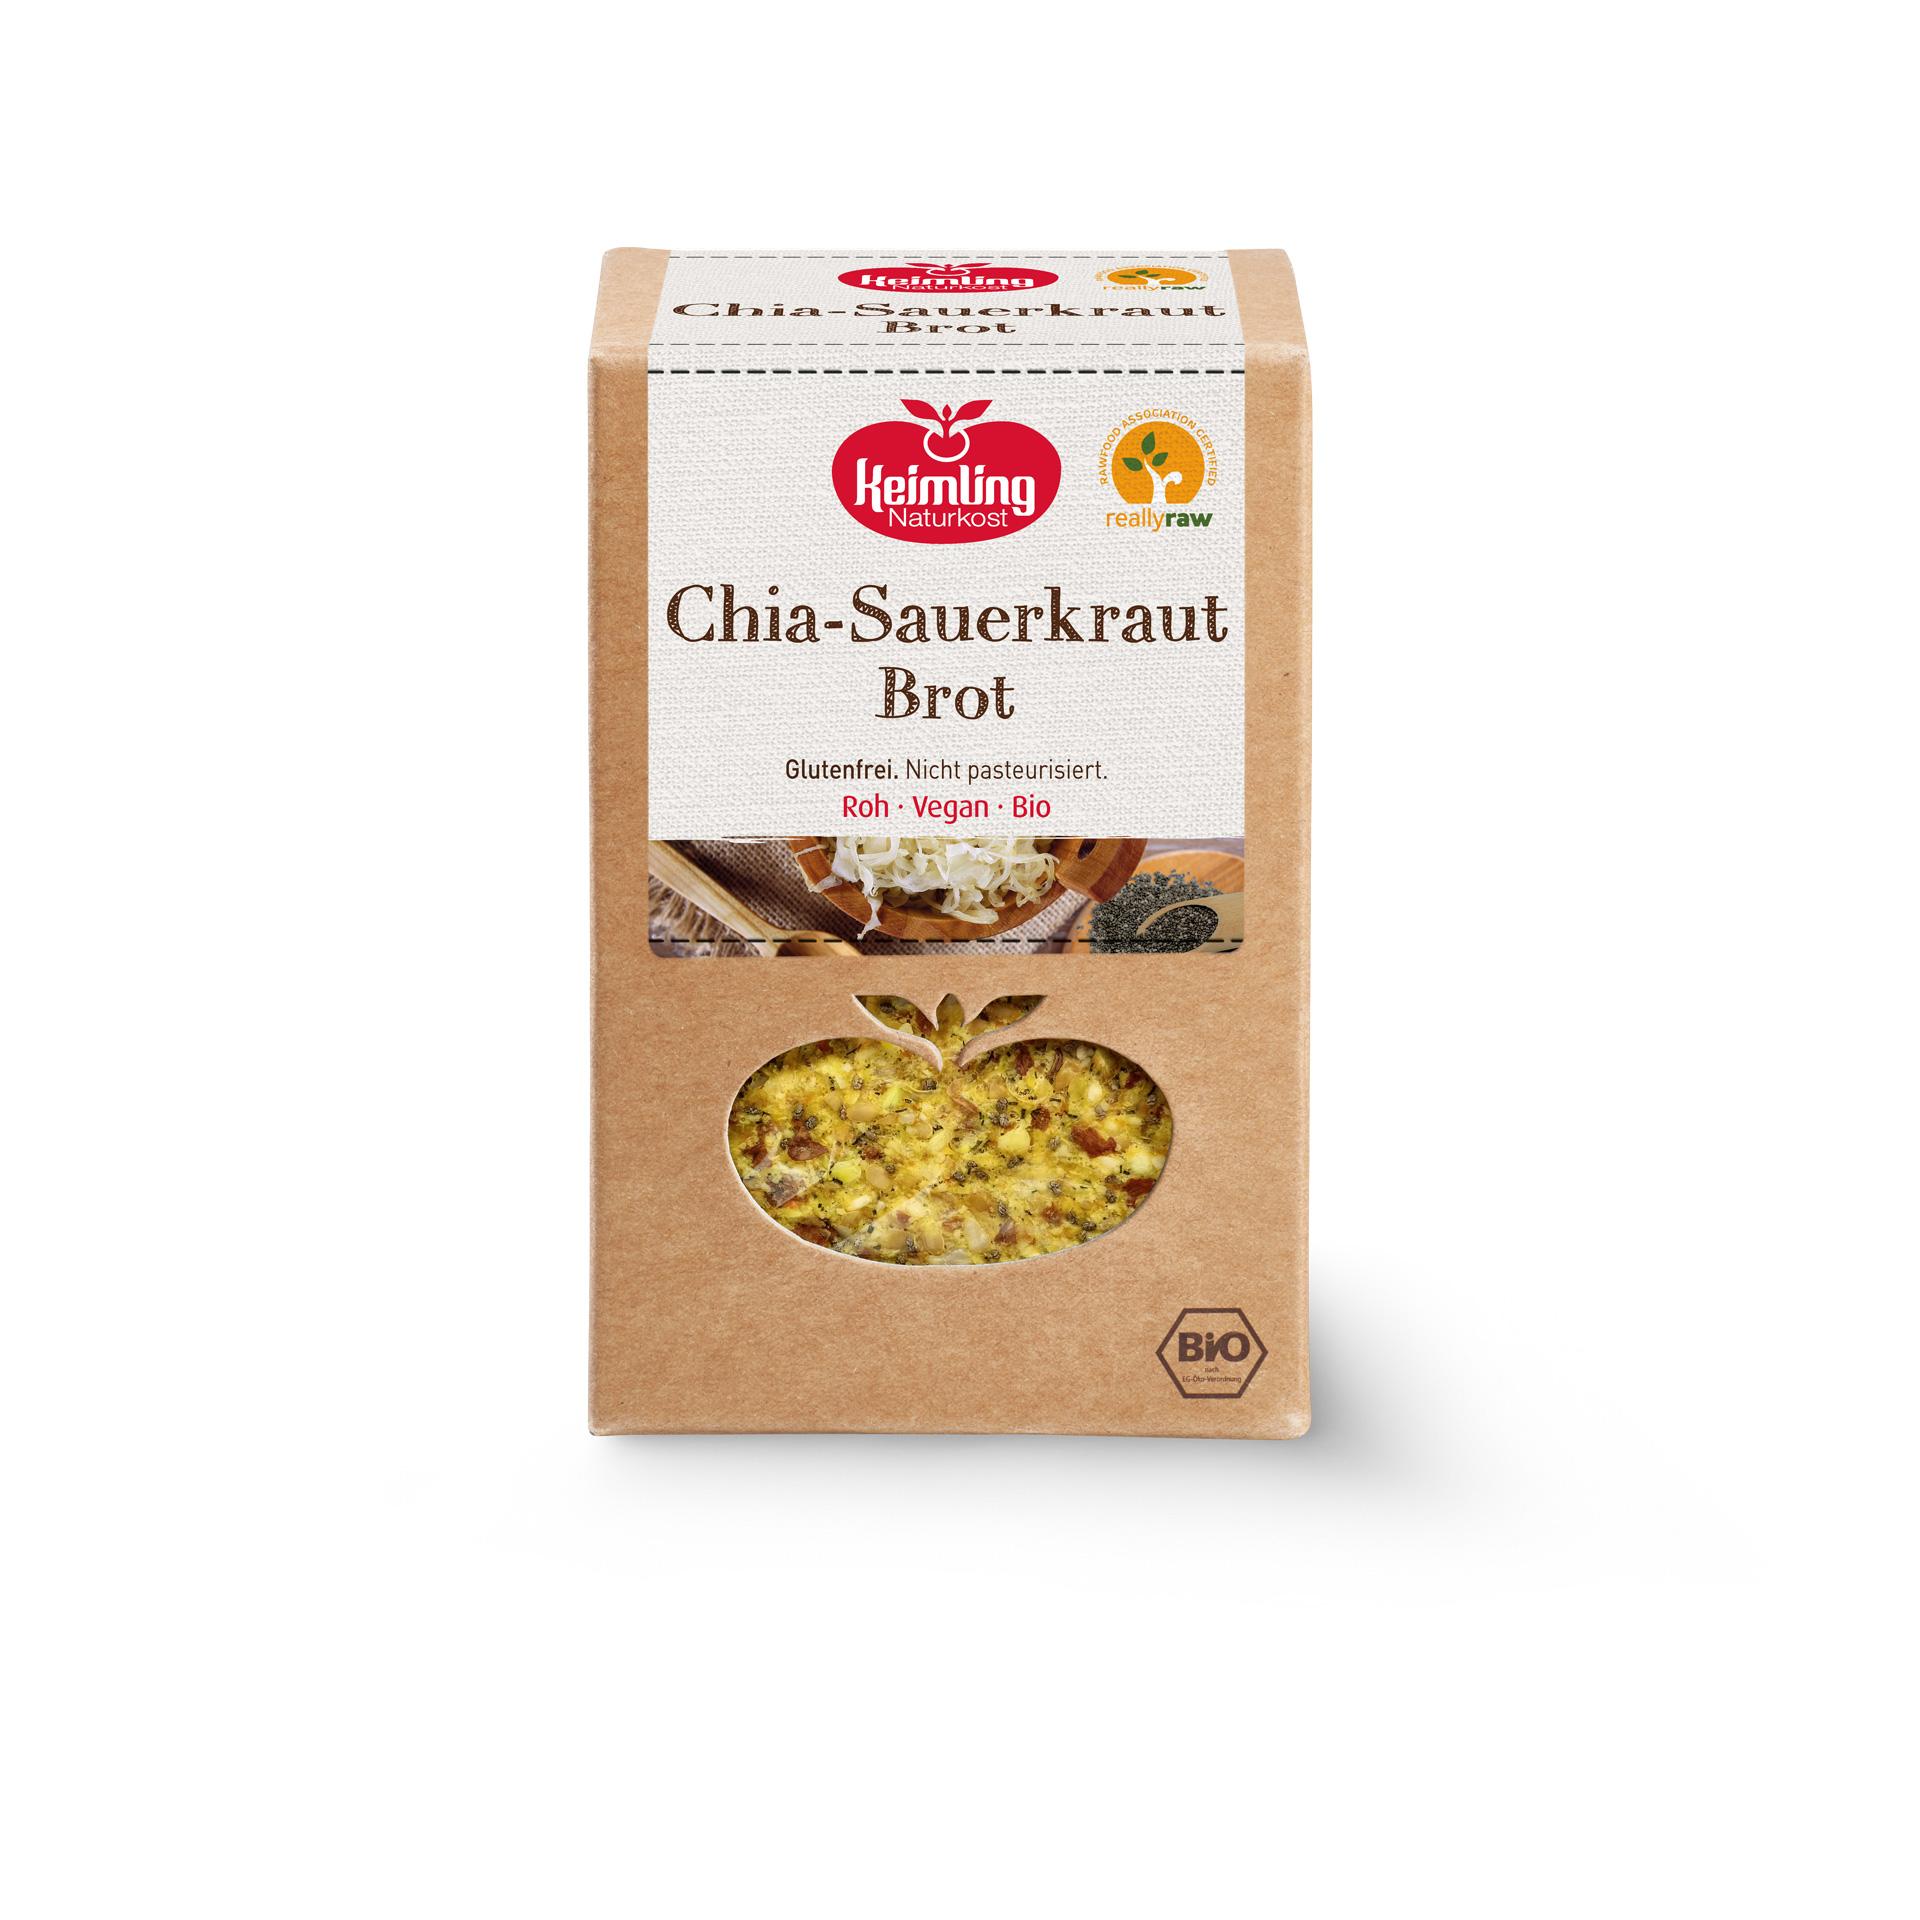 Chia-Sauerkraut Brot von Keimling Naturkost, really-raw zertifiziert